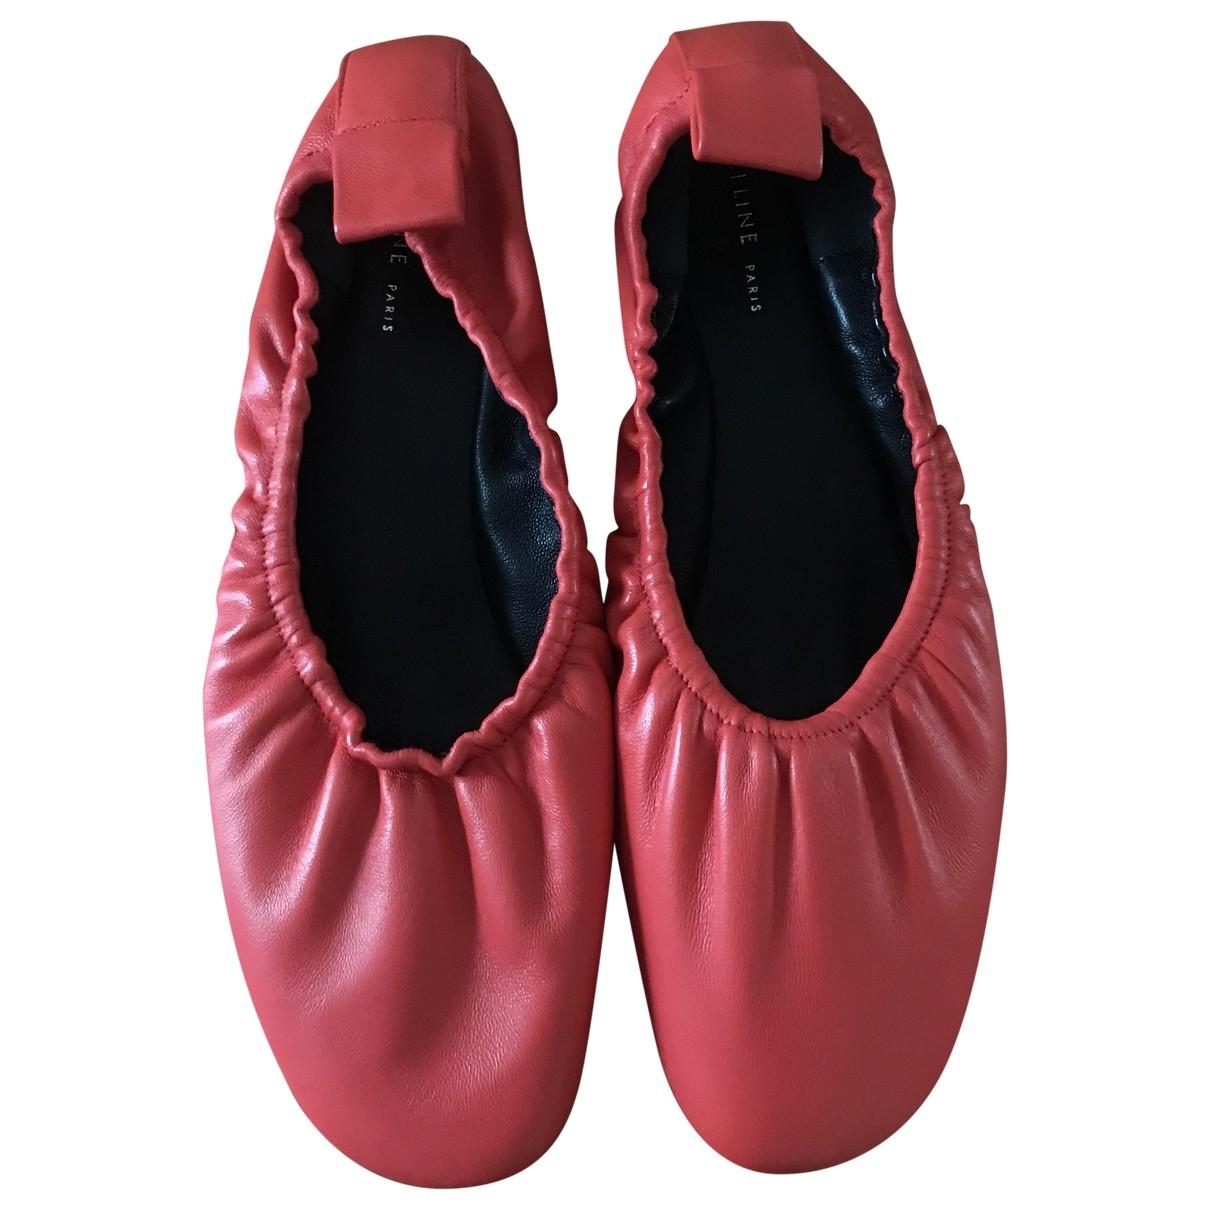 Celine - Ballerines Soft Ballerina pour femme en cuir - orange